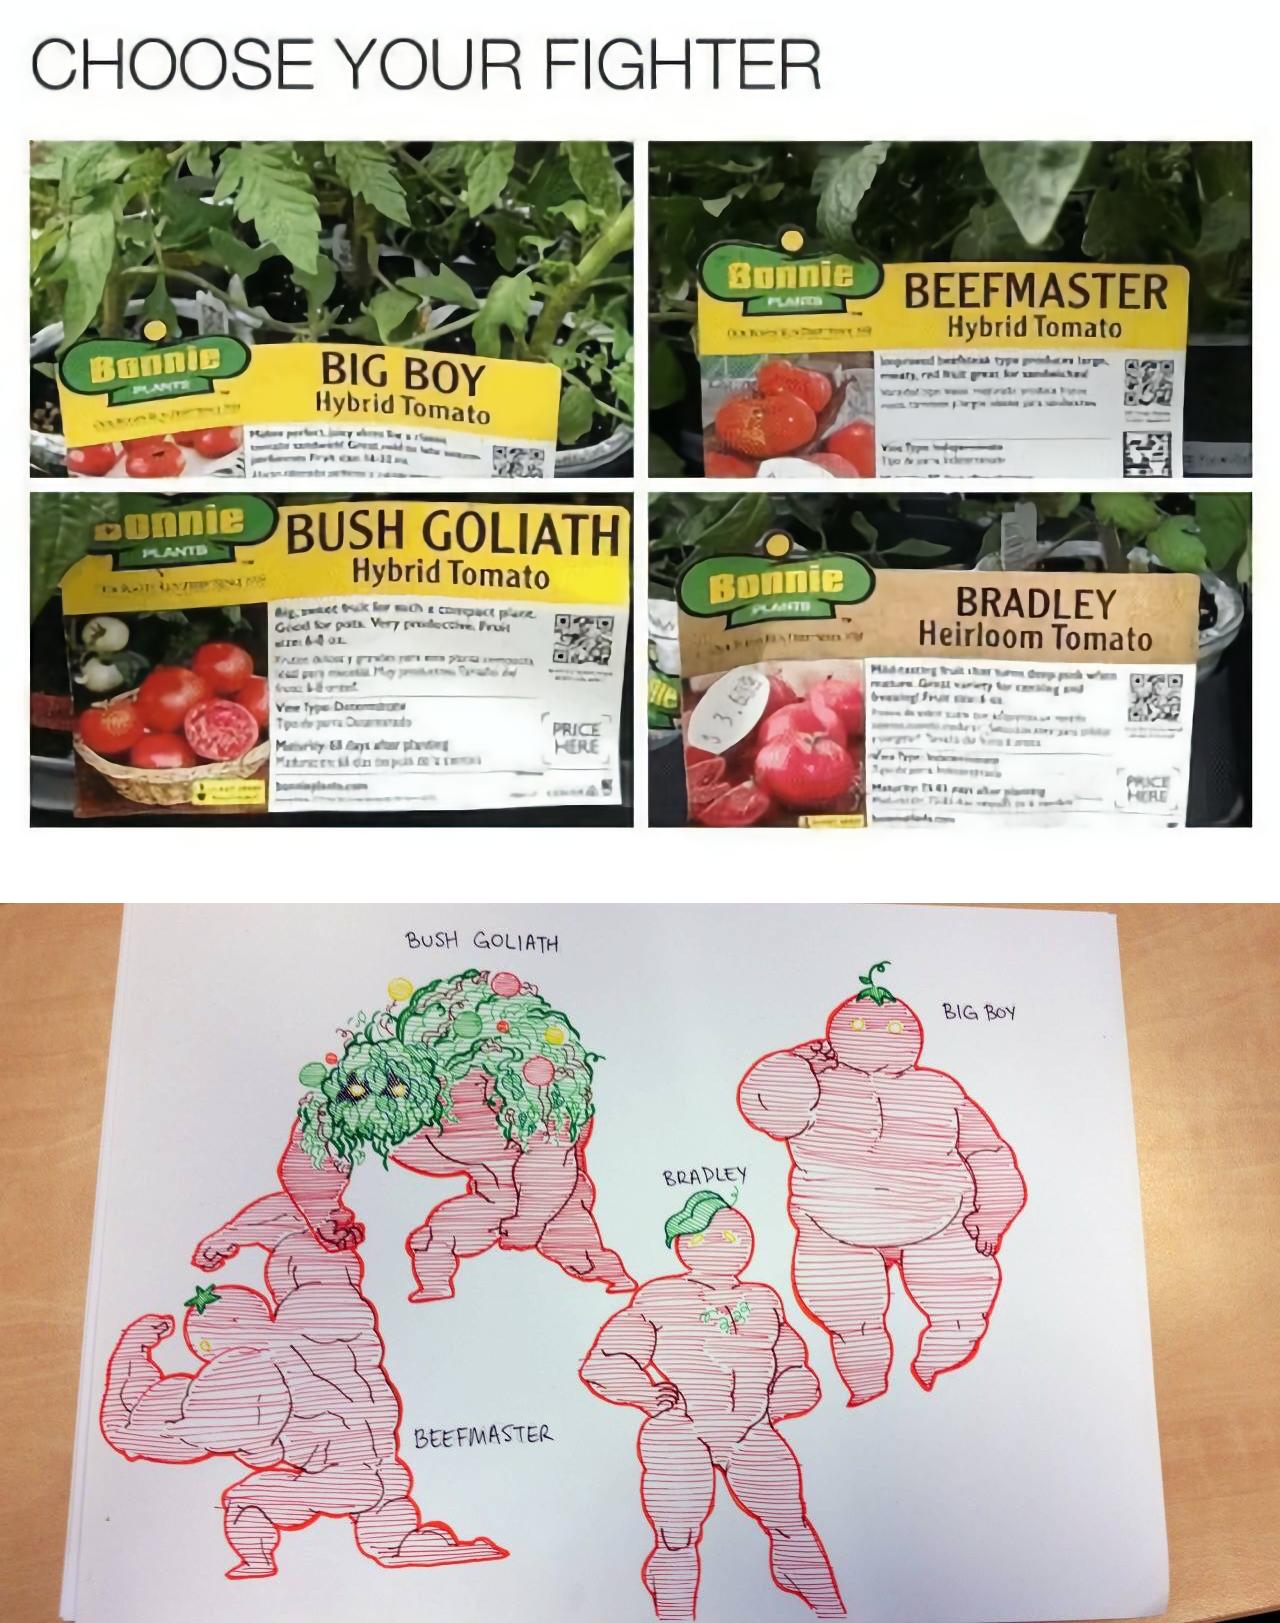 Choose Your Fighter Bunnie Beefmaster Hybrid Tomato Boy 2r Bush Goliath